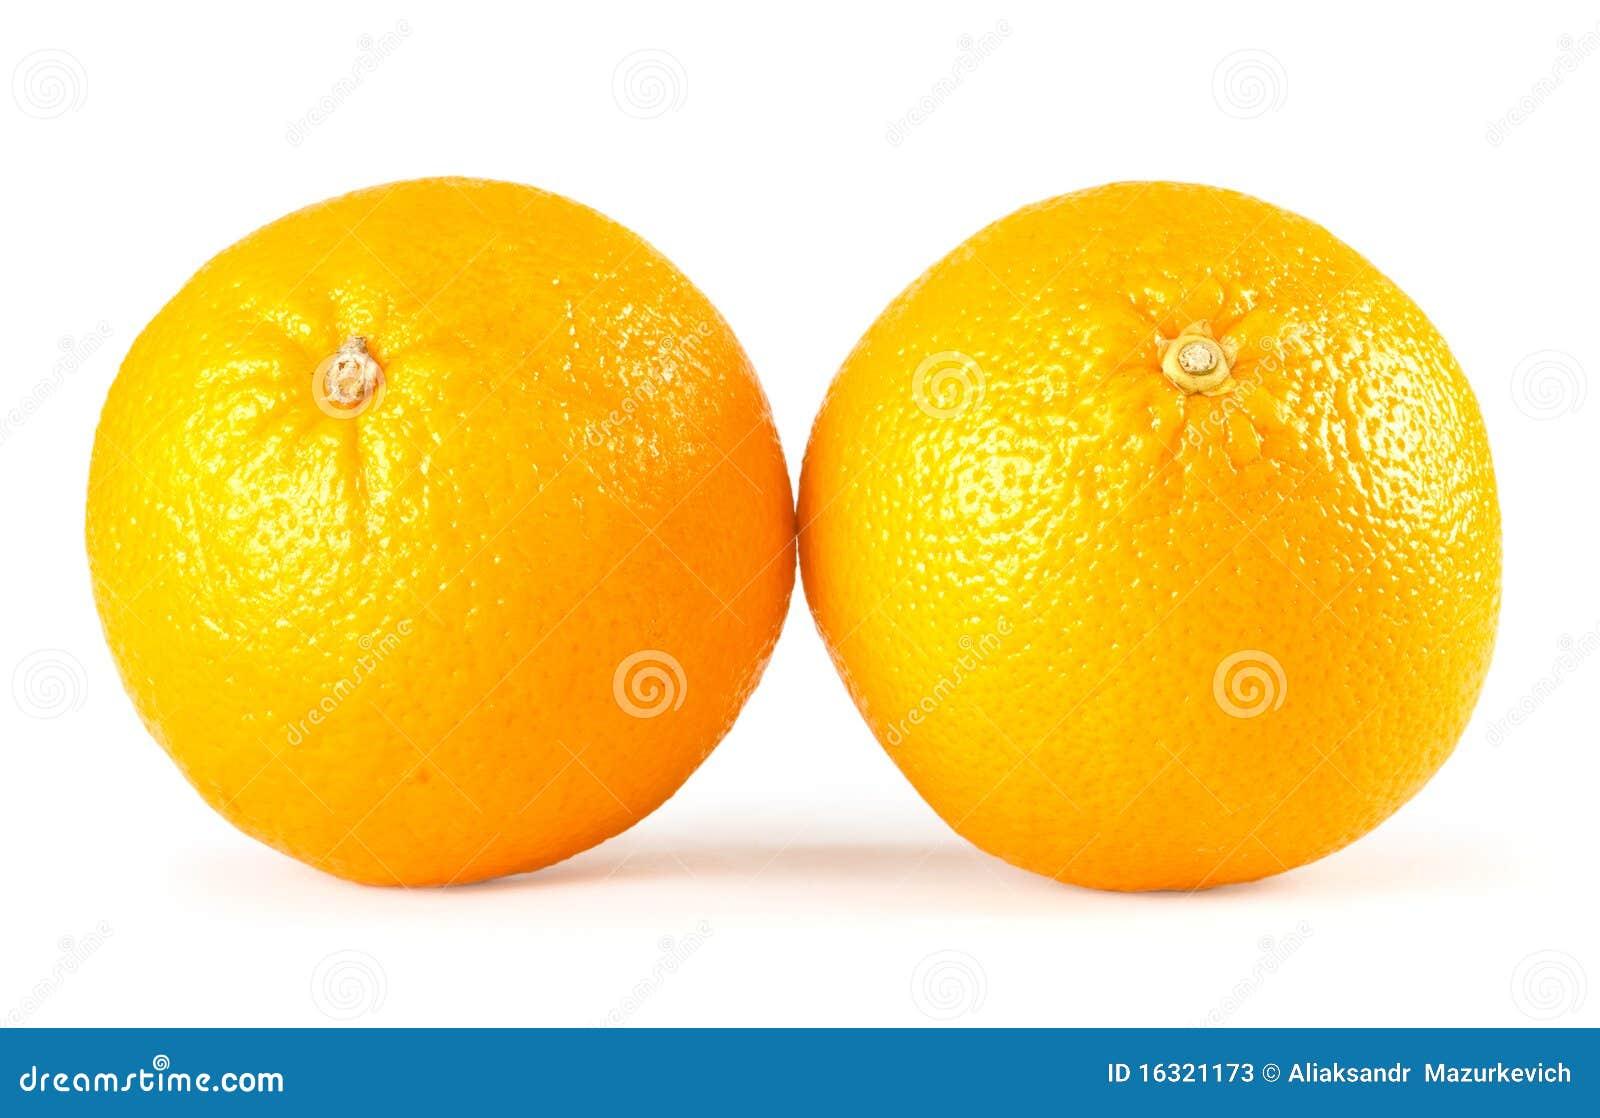 Two Oranges Stock Photos - Image: 16321173